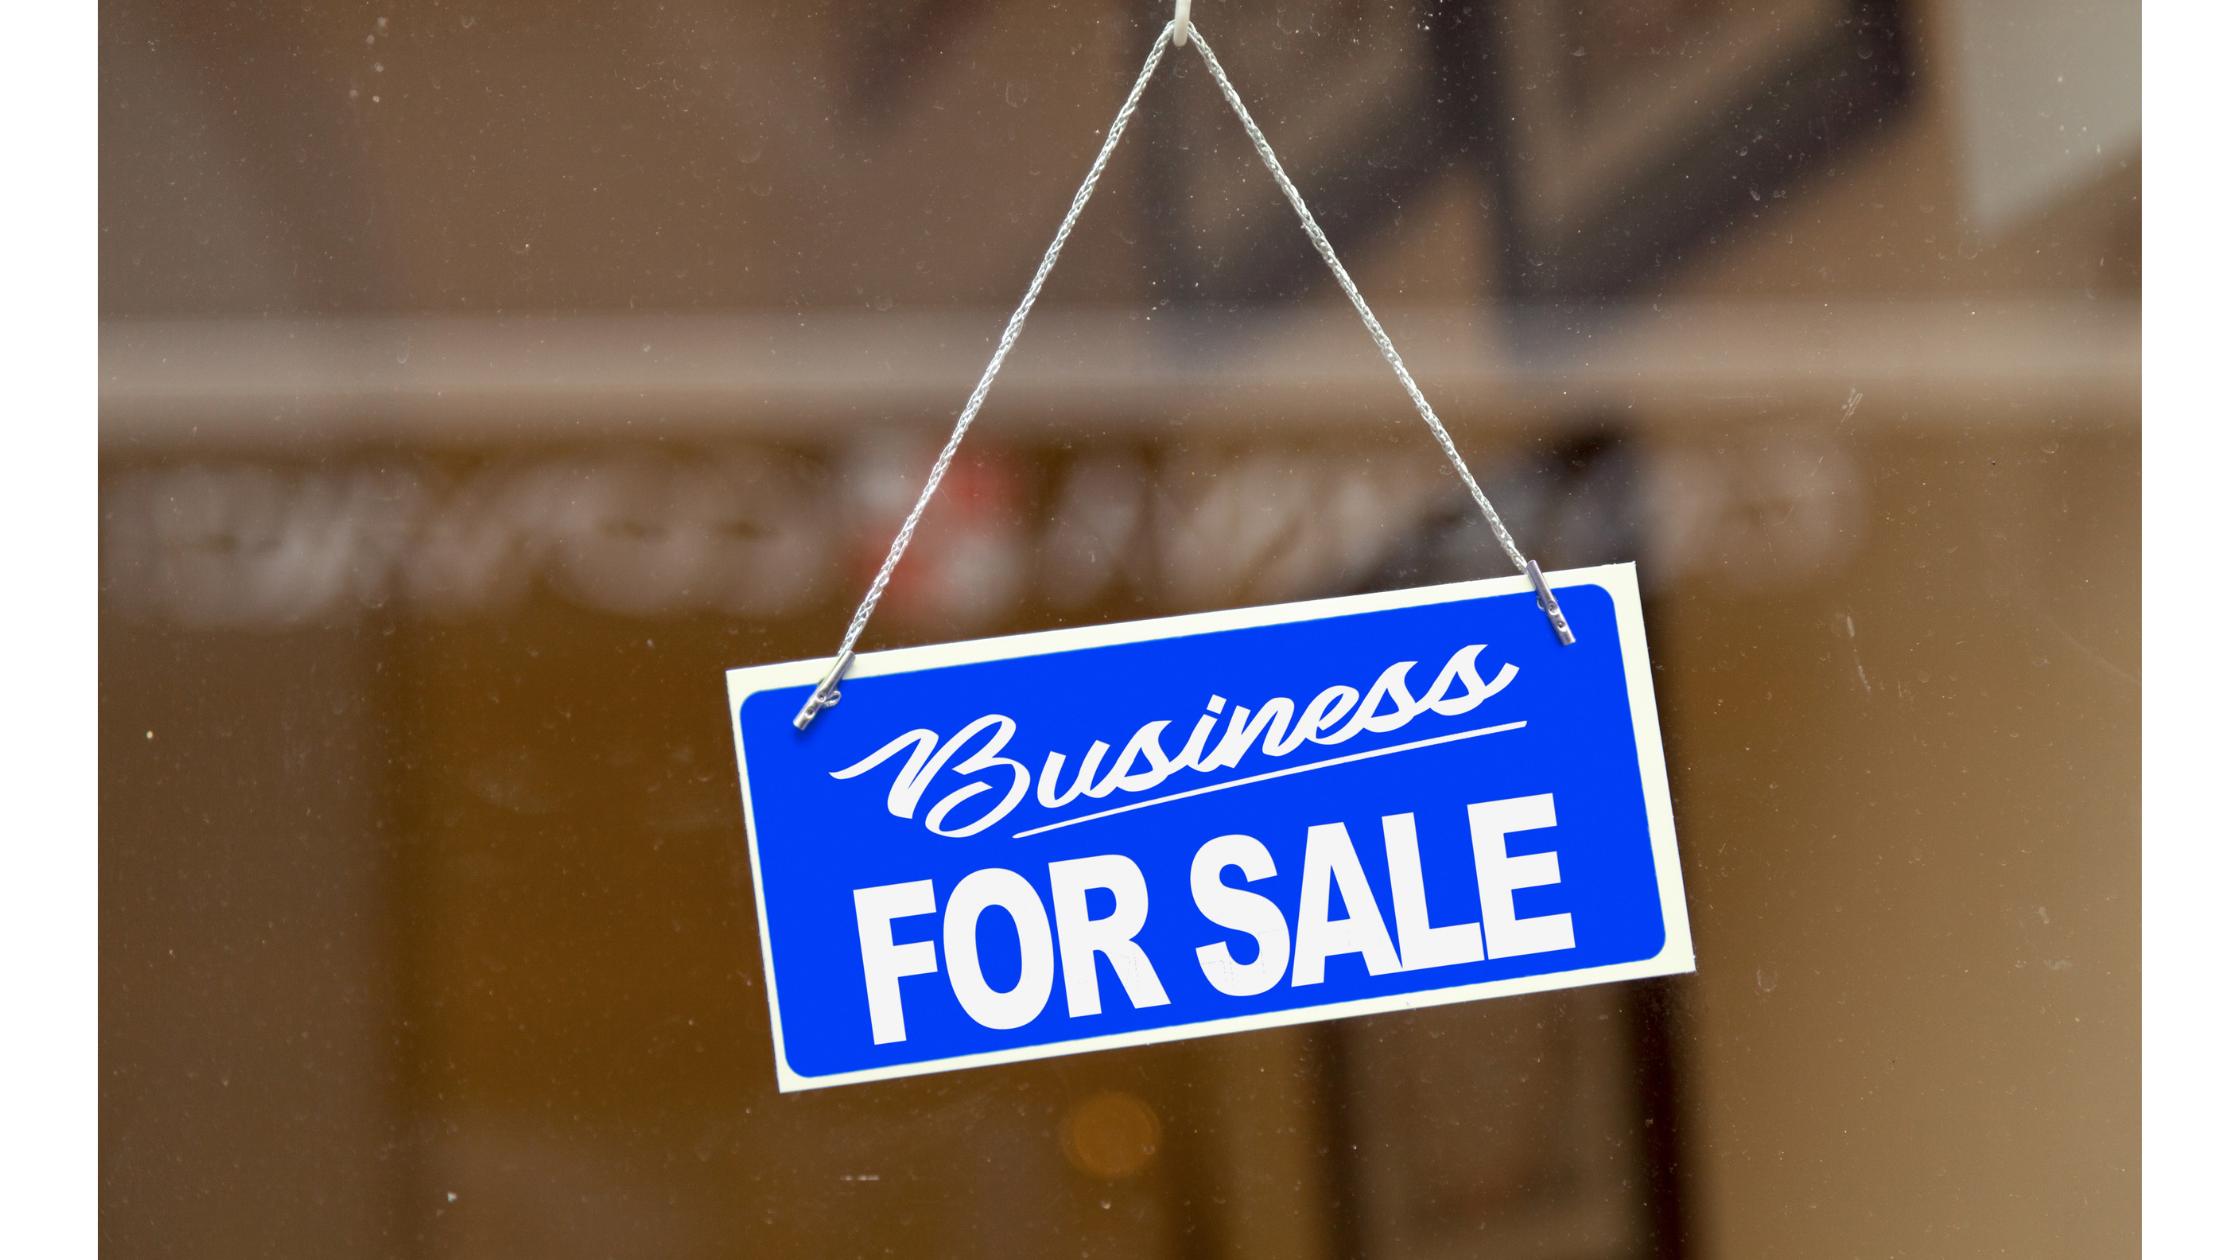 Asset Sale versus Stock Sale